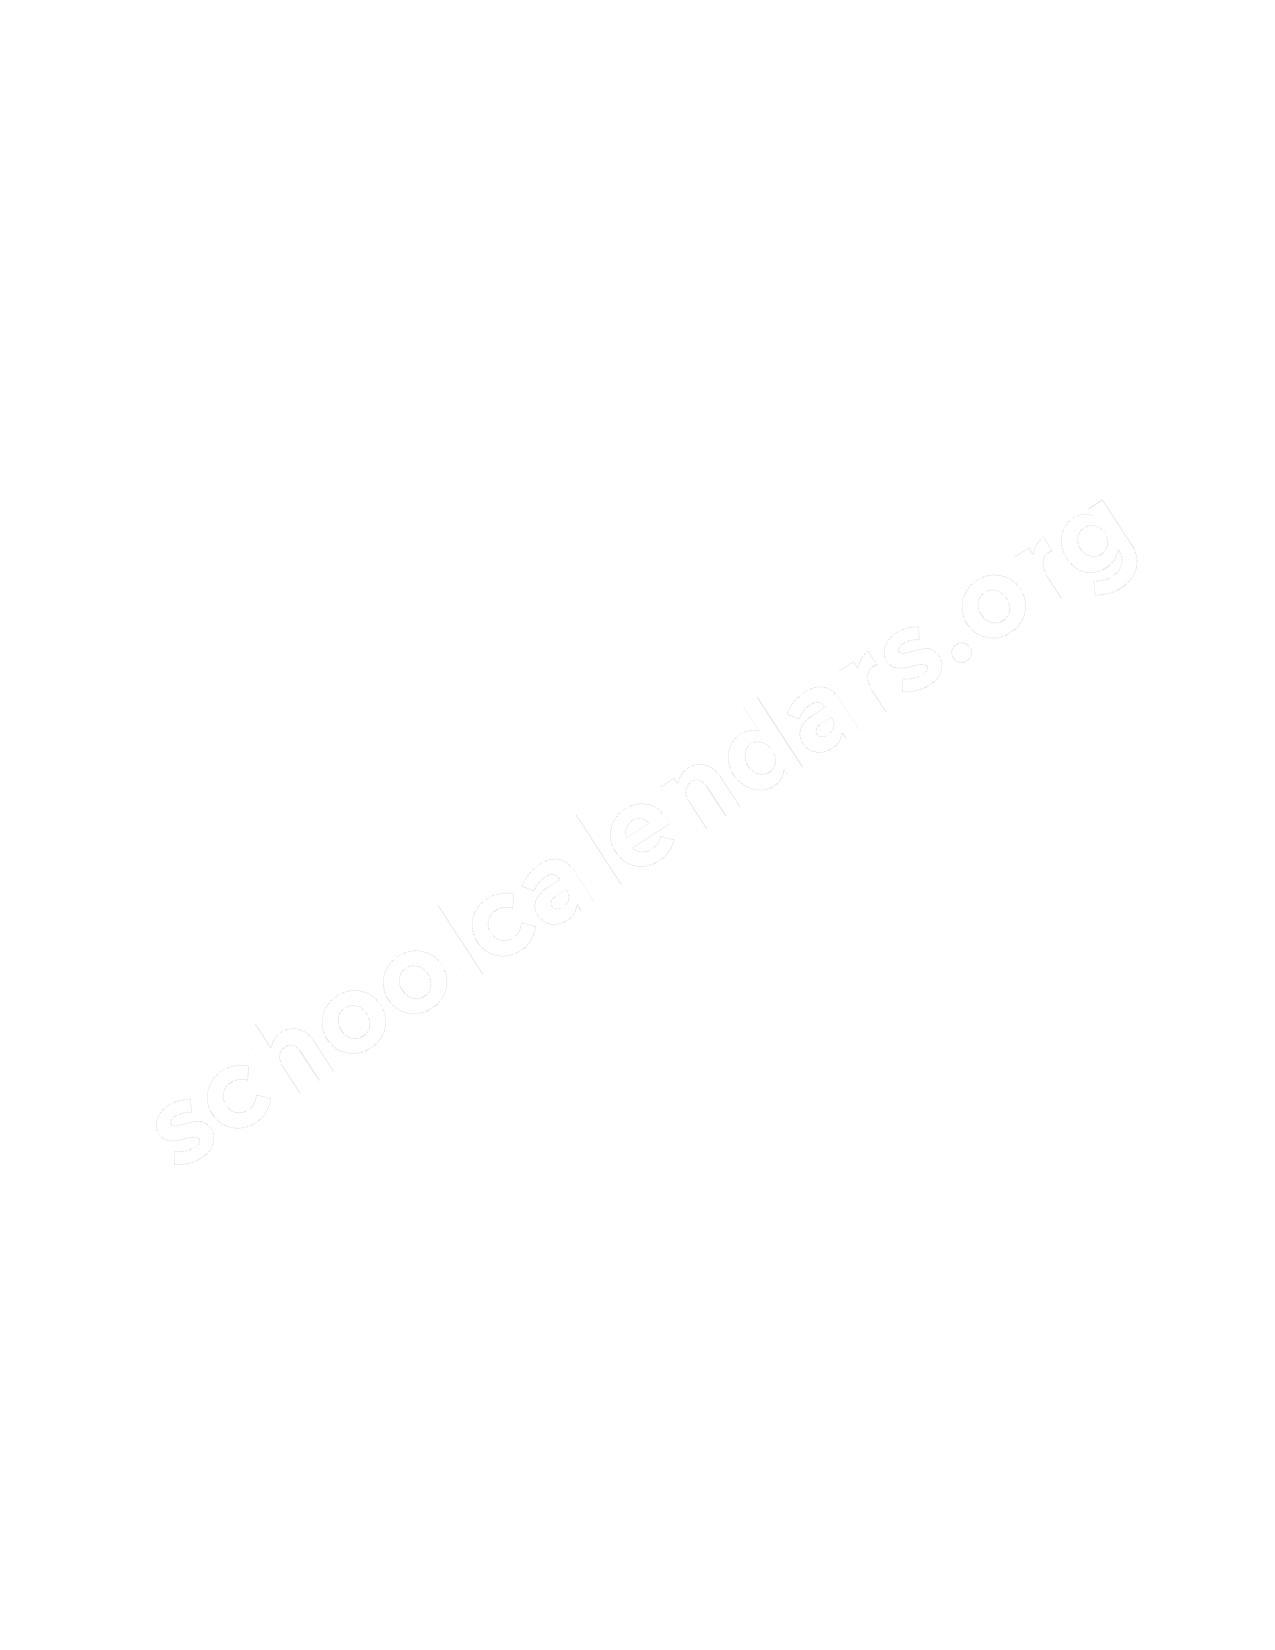 2015 - 2016 District Calendar – Stoner Prairie Elementary School – page 2